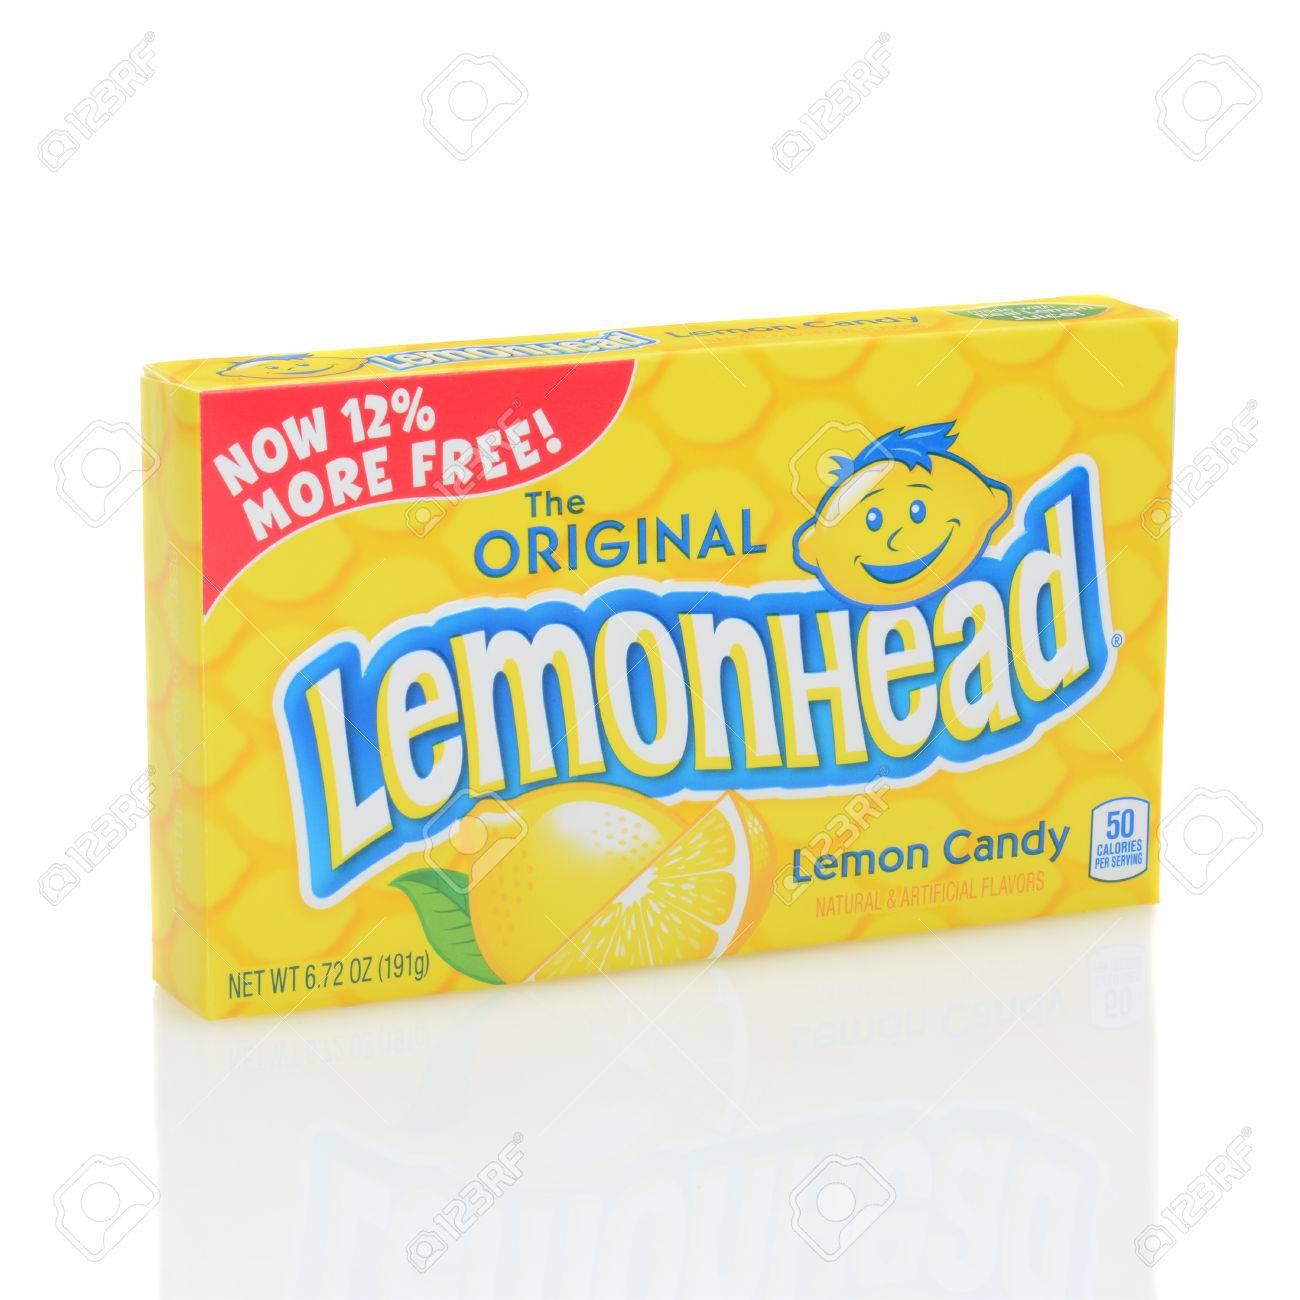 IRVINE, CALIFORNIA - DECEMBER 12, 2014: A box of Lemonhead Candy